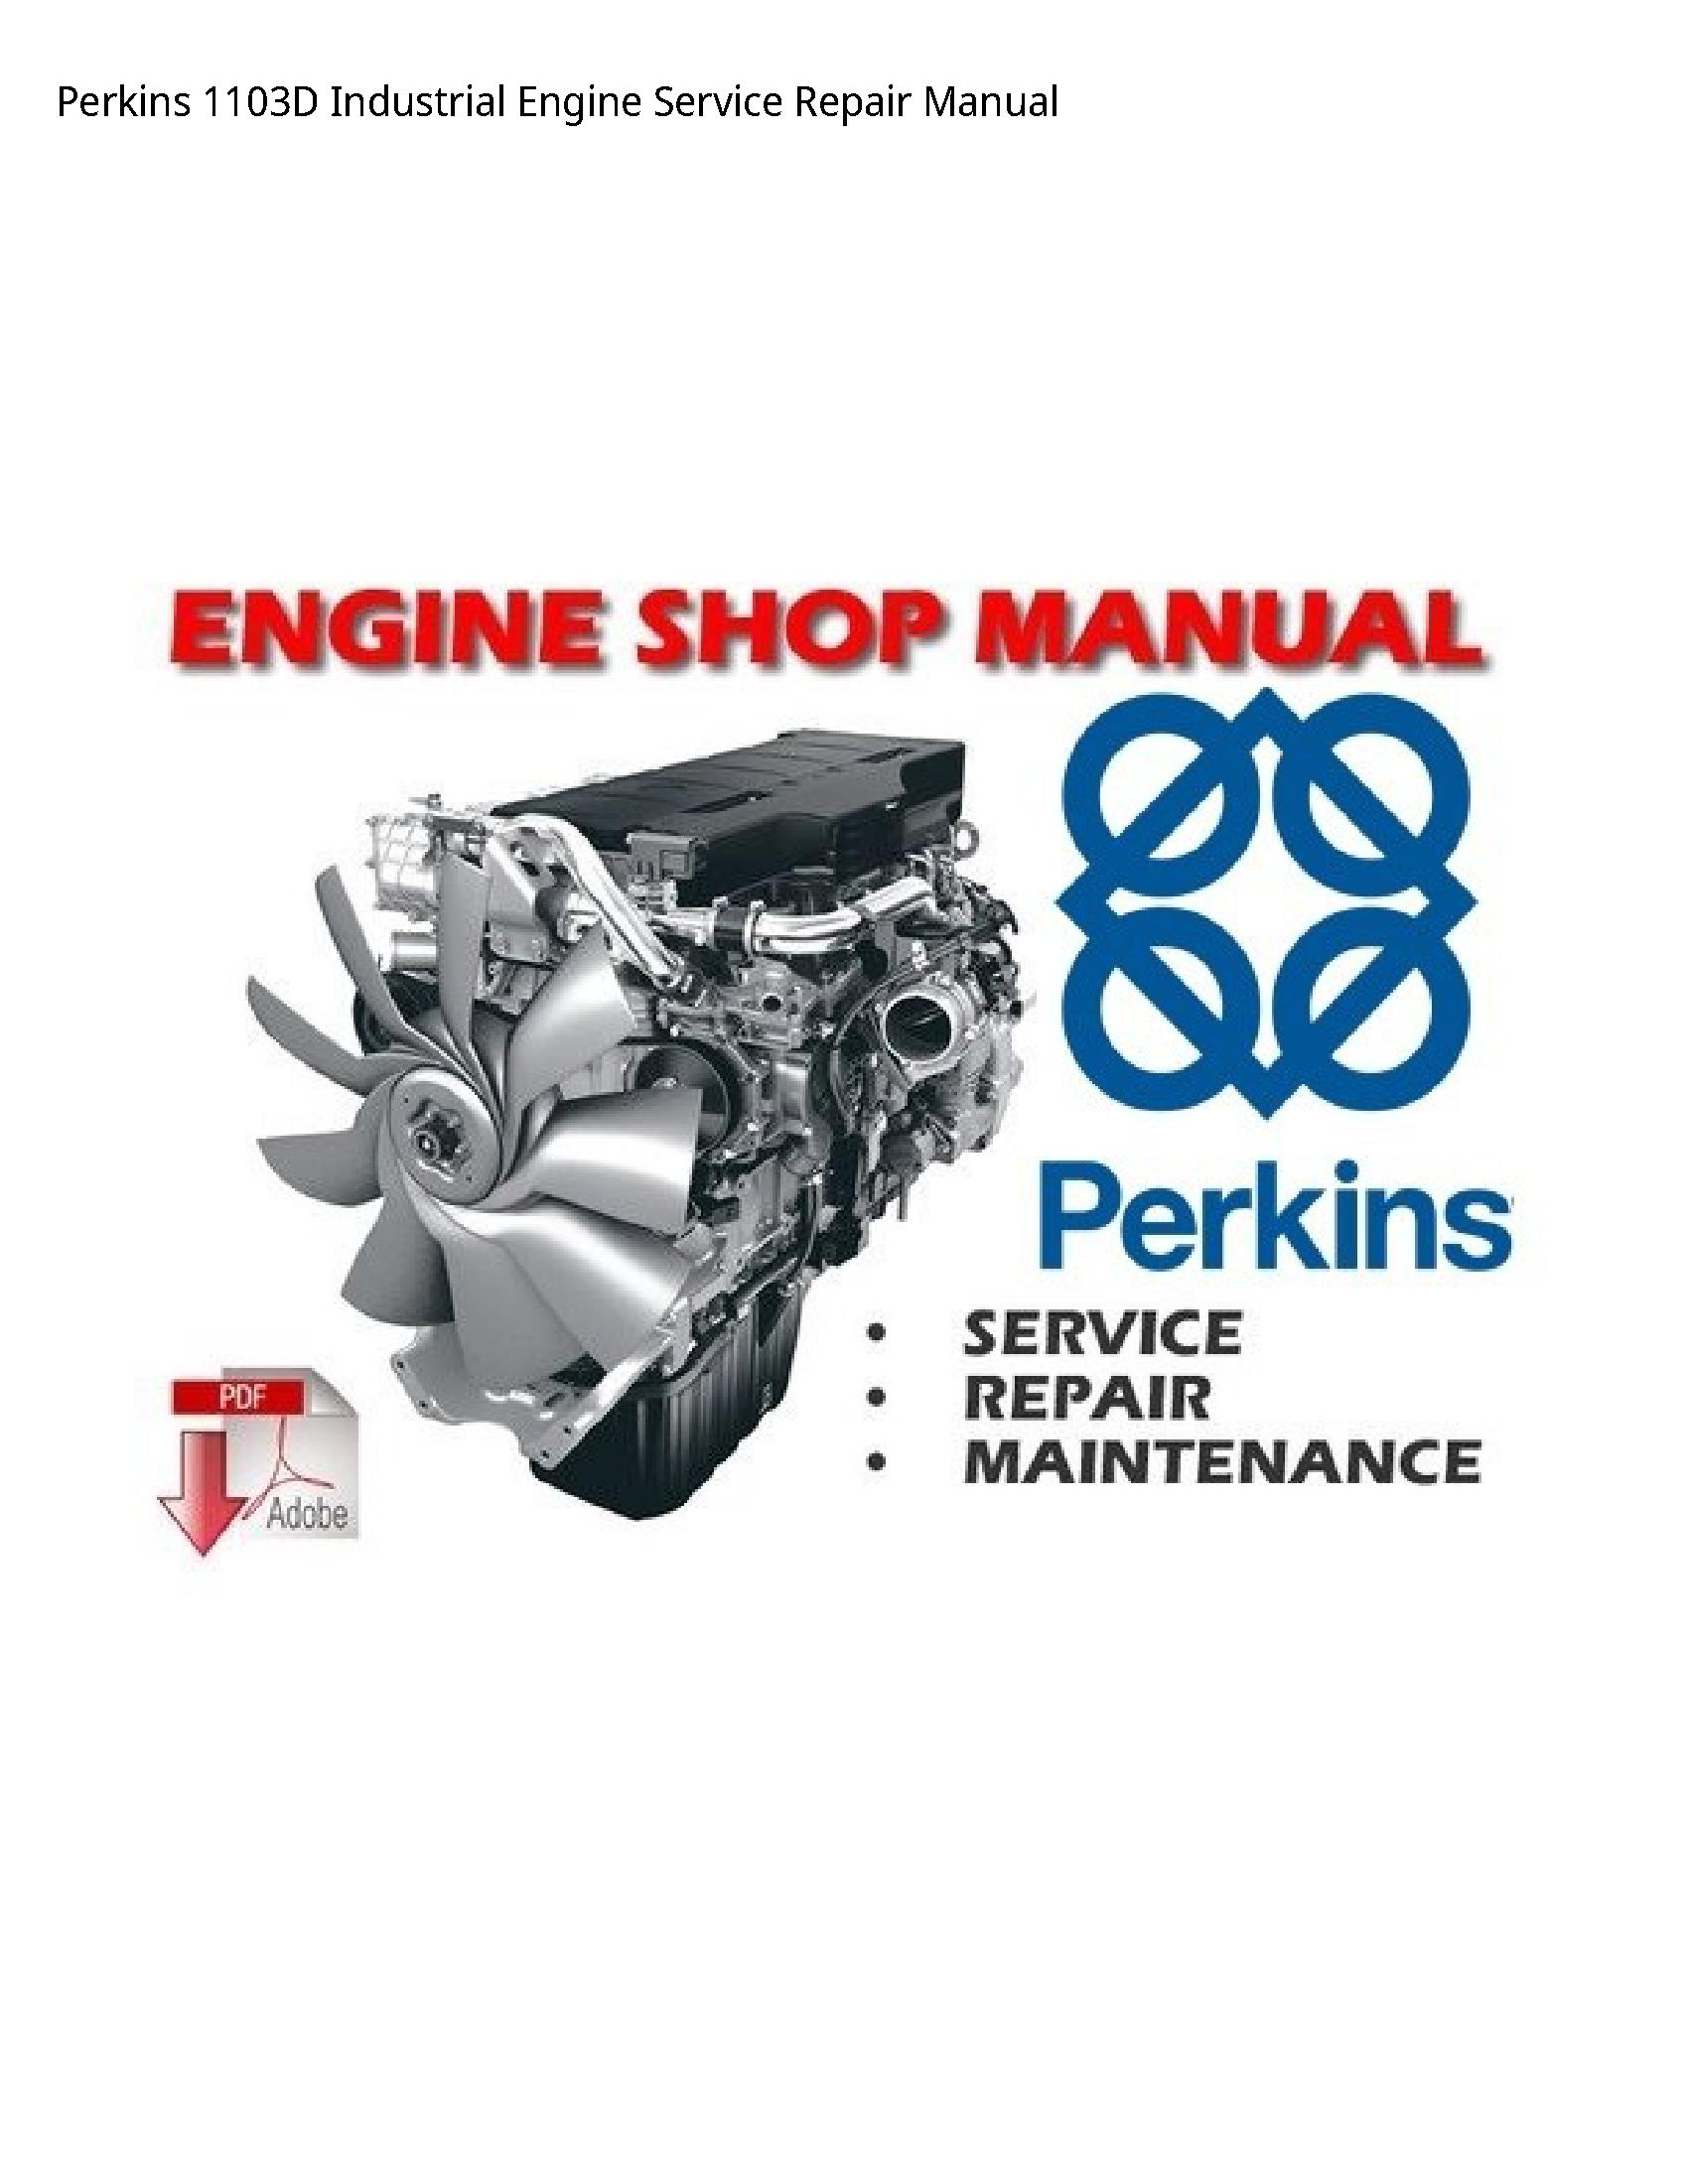 Perkins 1103D Industrial Engine manual